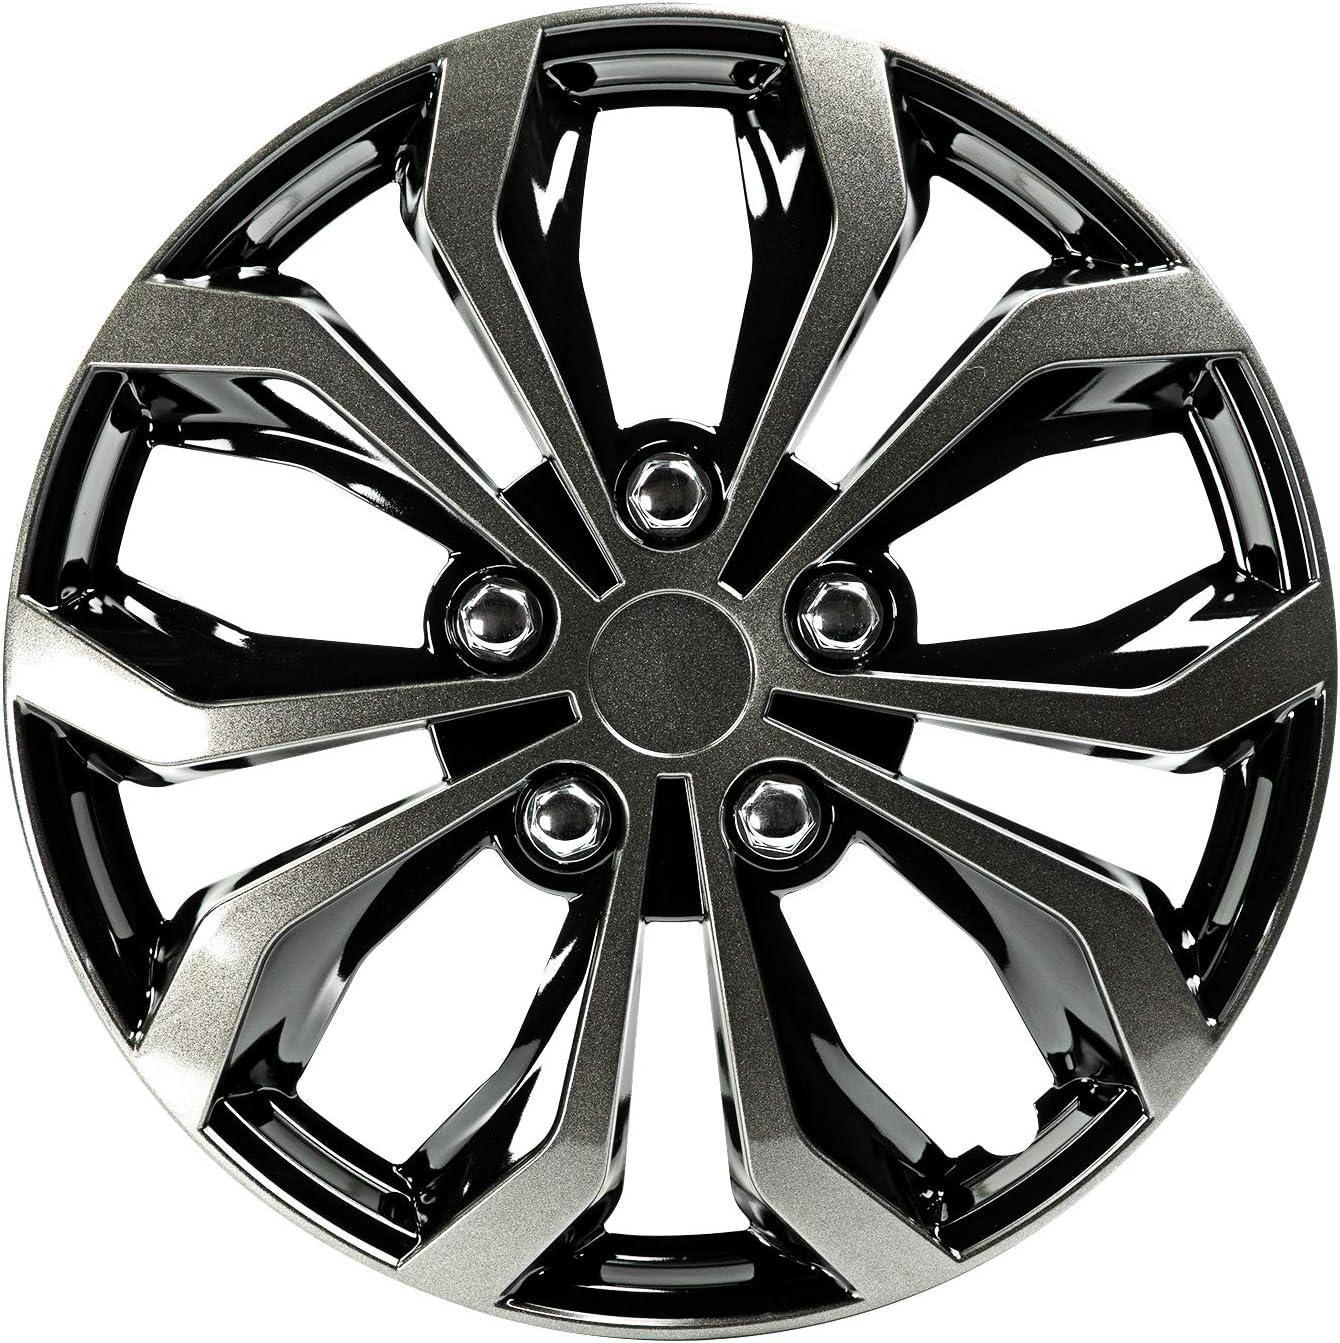 Pilot 17 inches Spyder Performance Wheel Cover Black//Gun Metal